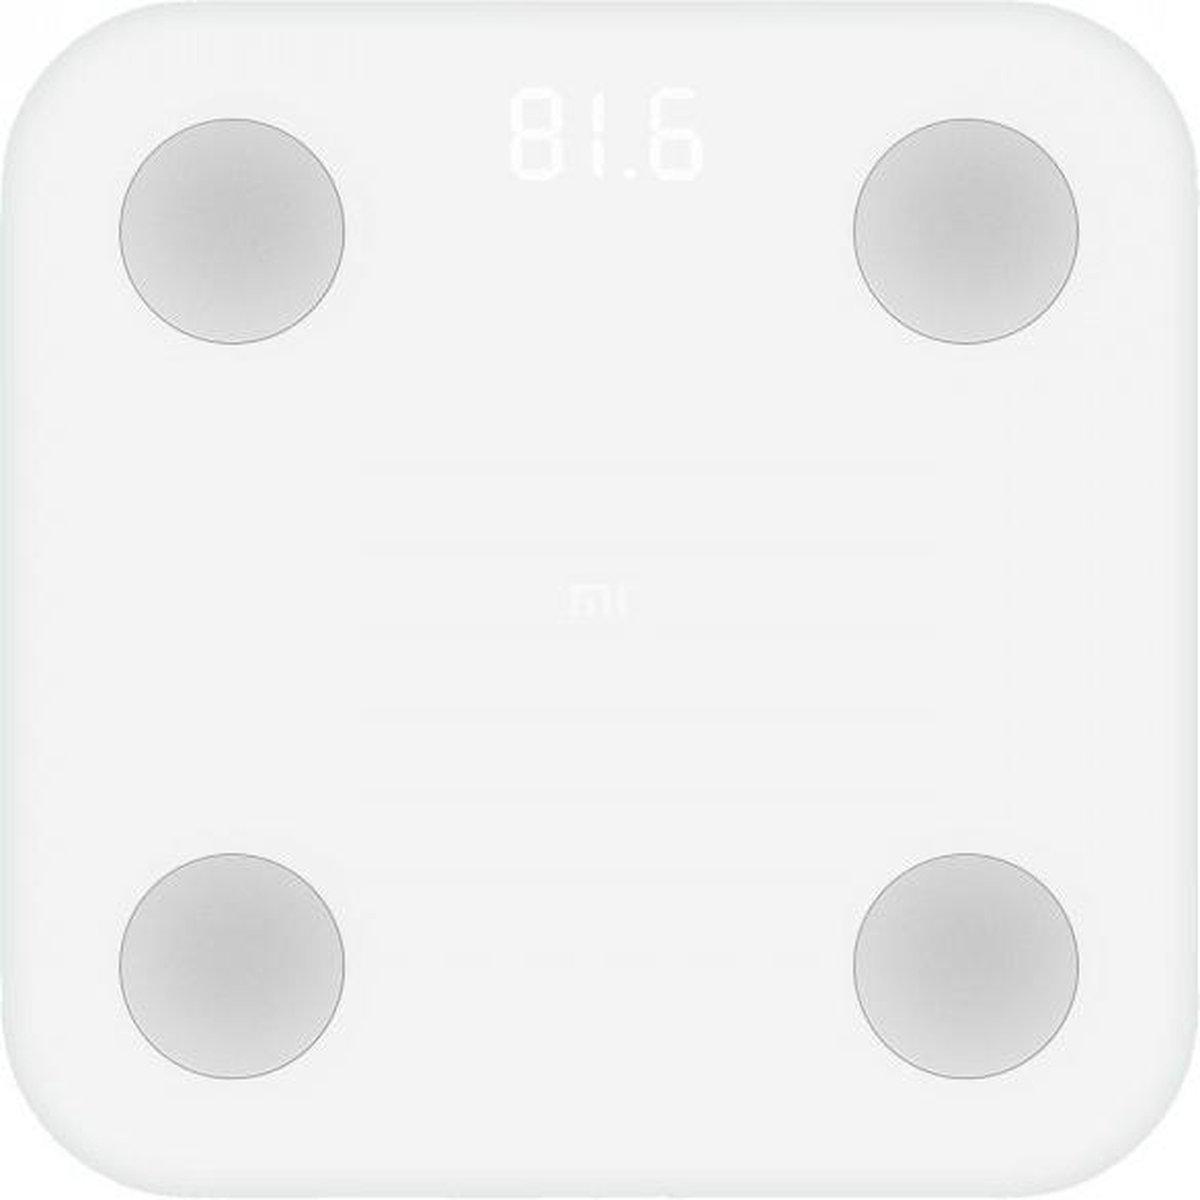 Xiaomi Mi Body Composition Smart Scale 2 - Slimme Lichaamsanalyseweegschaal